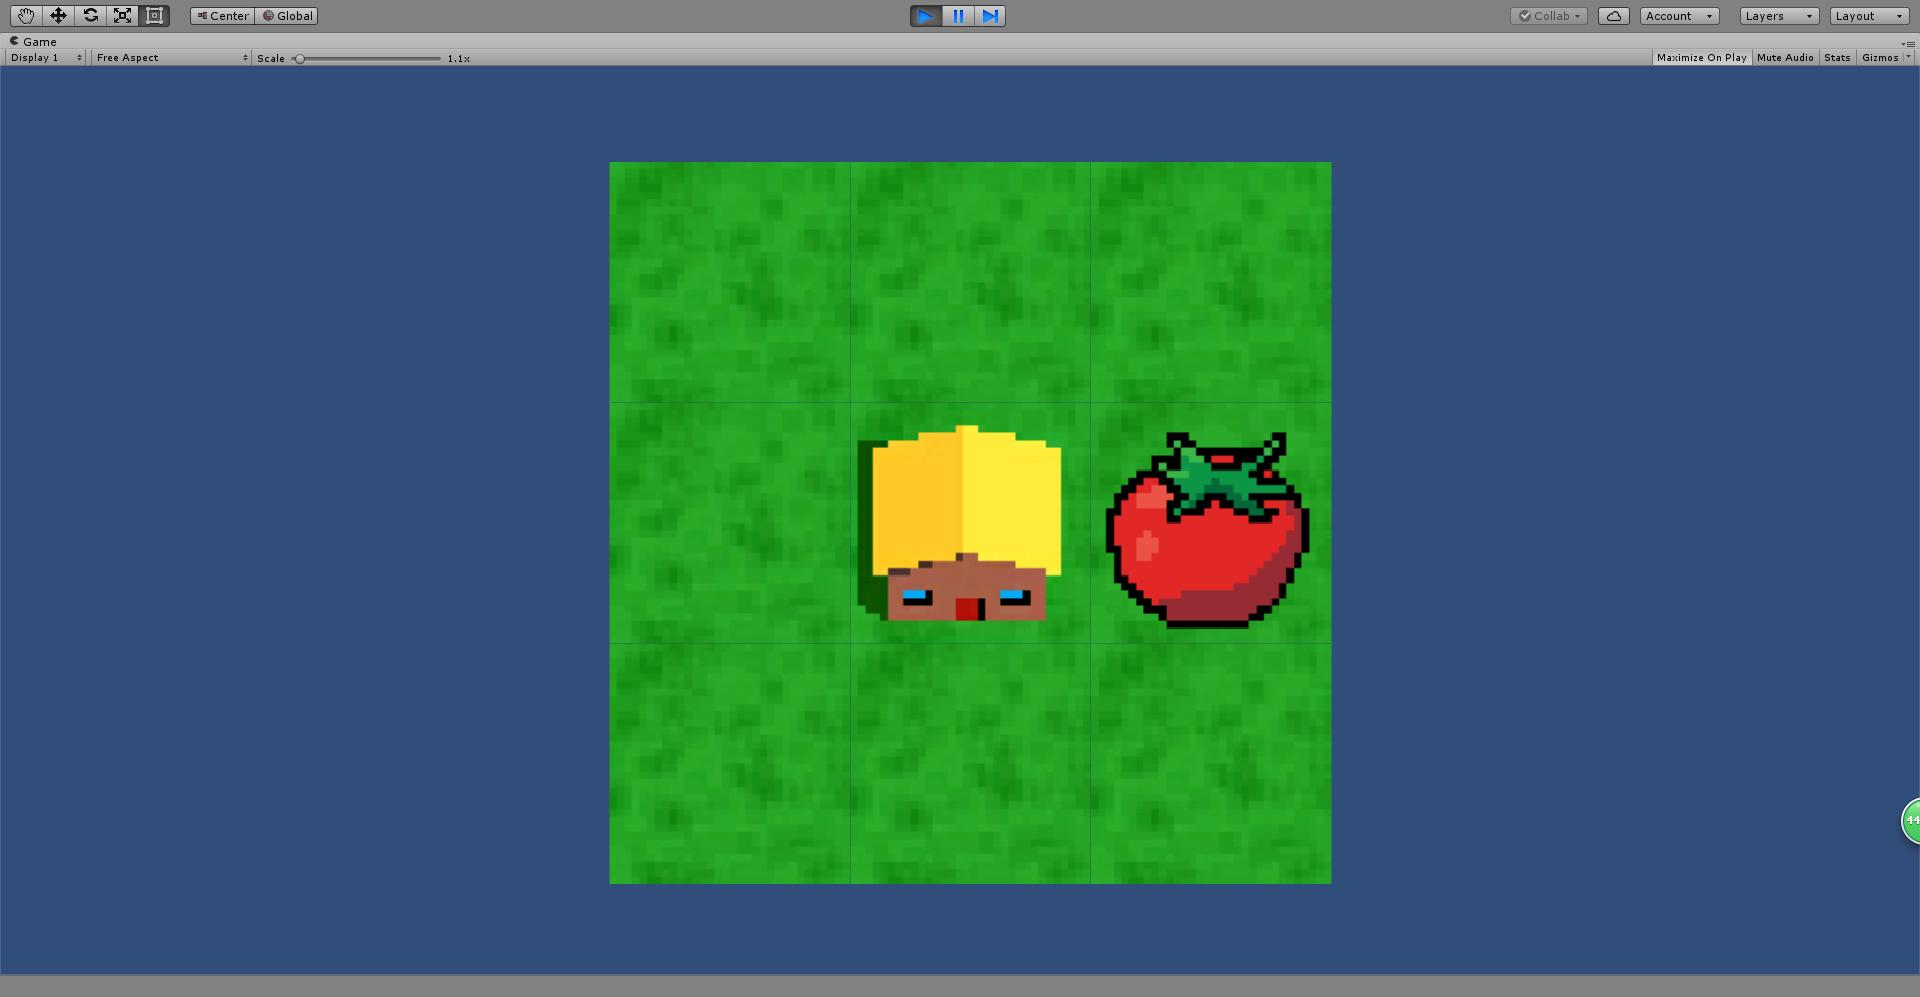 Farmer vs Malwart prototype